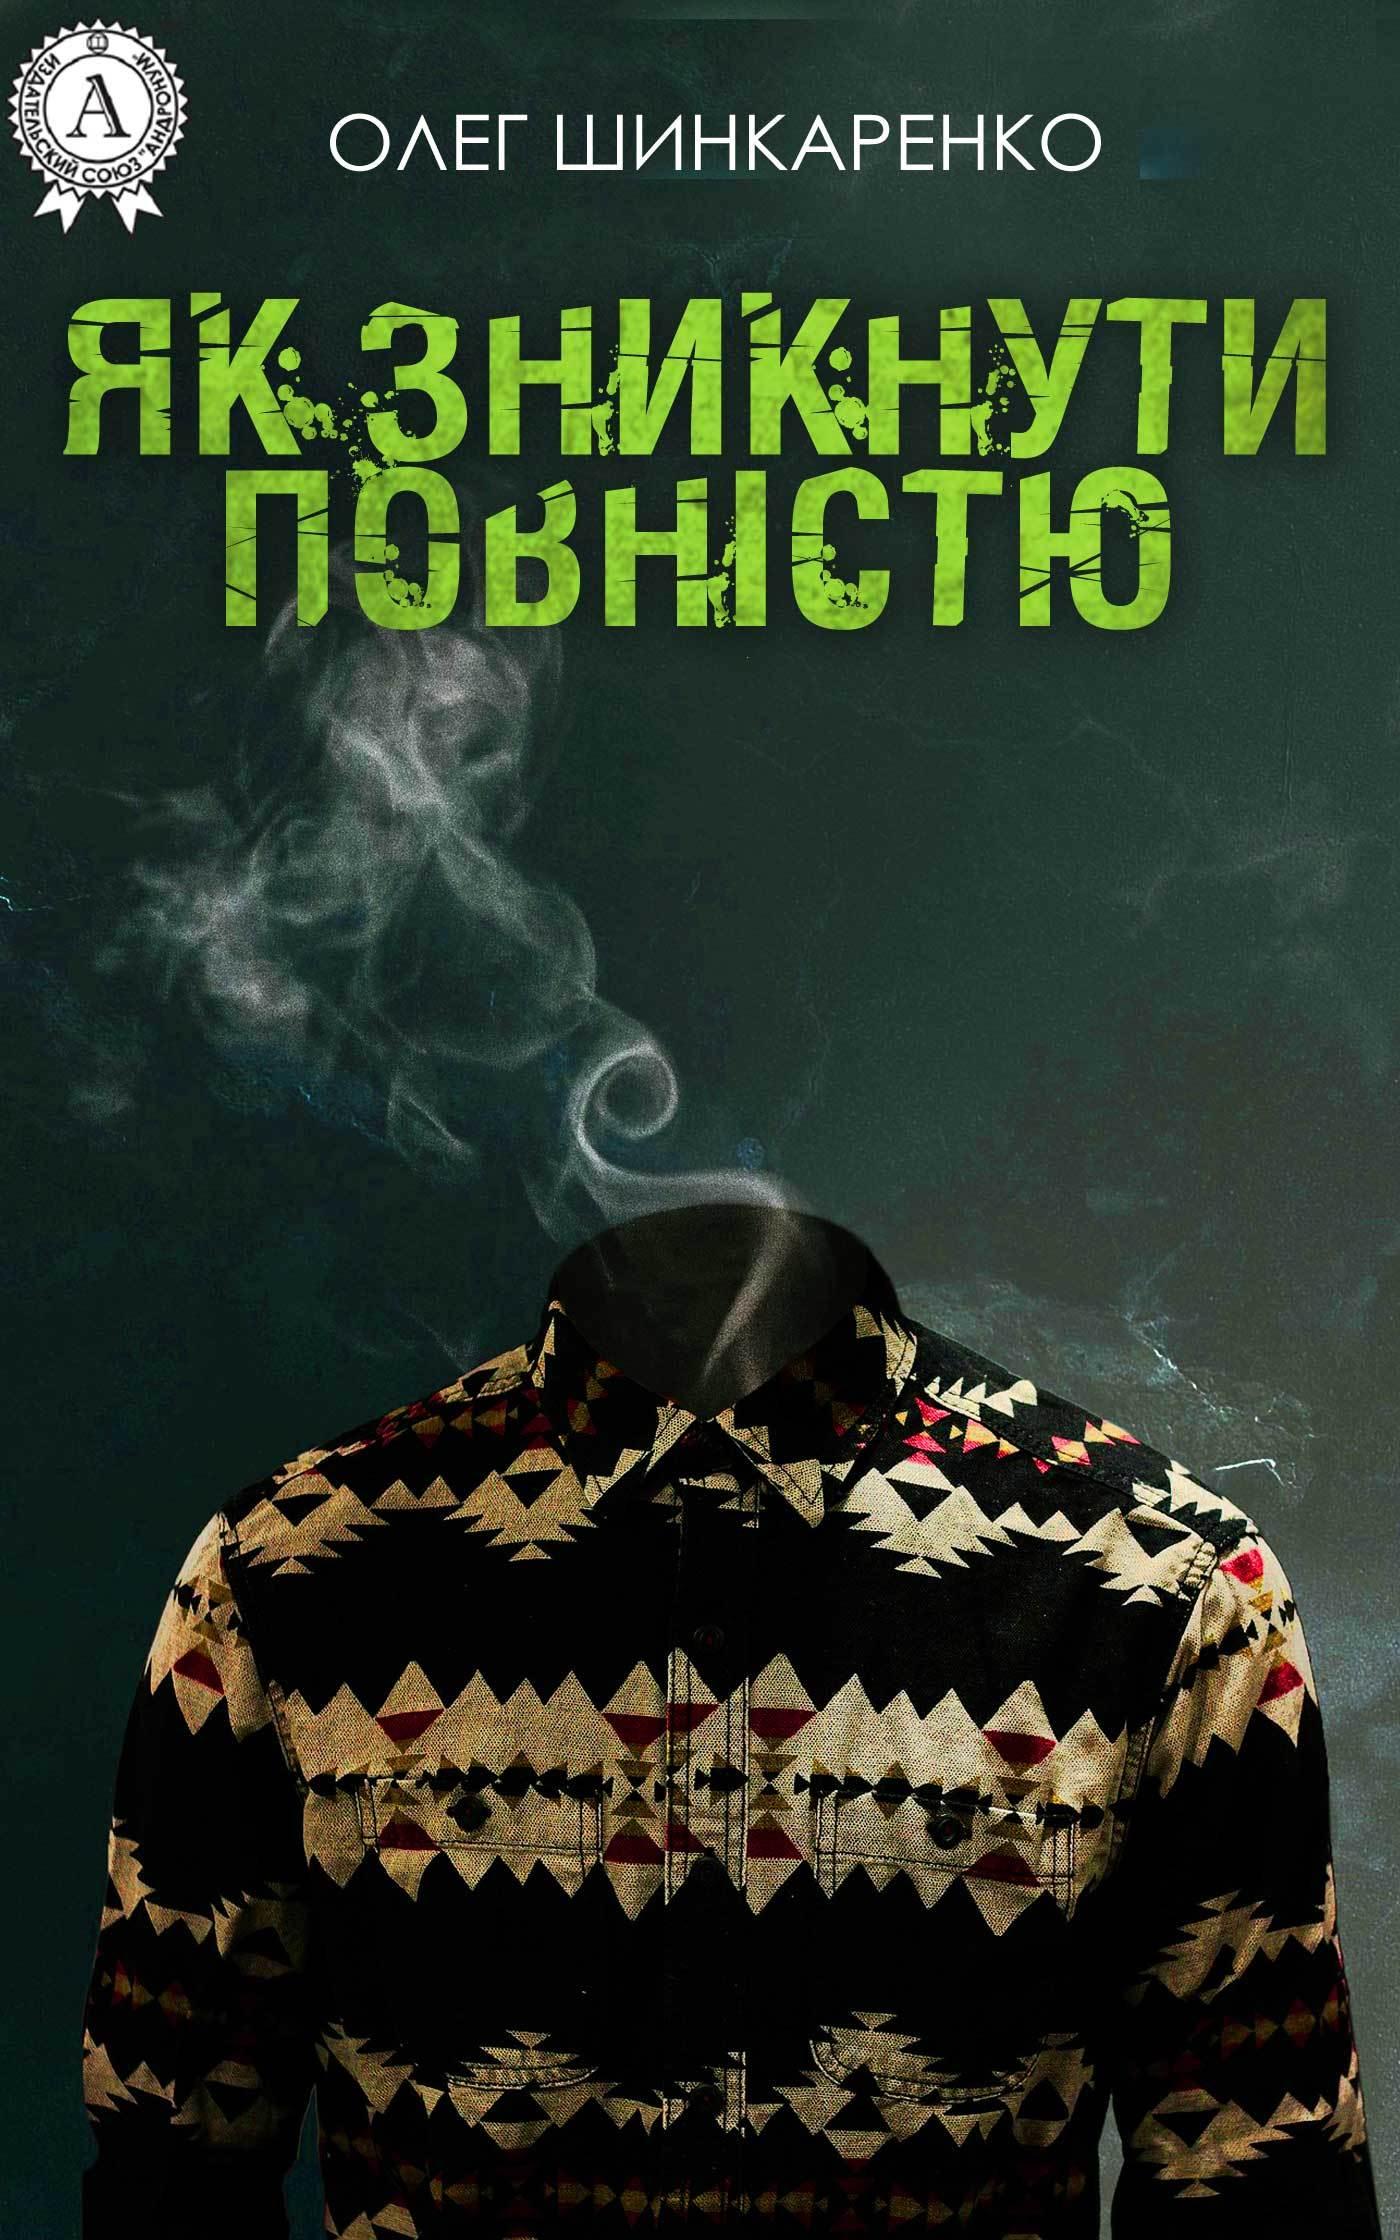 Олег Шинкаренко бесплатно